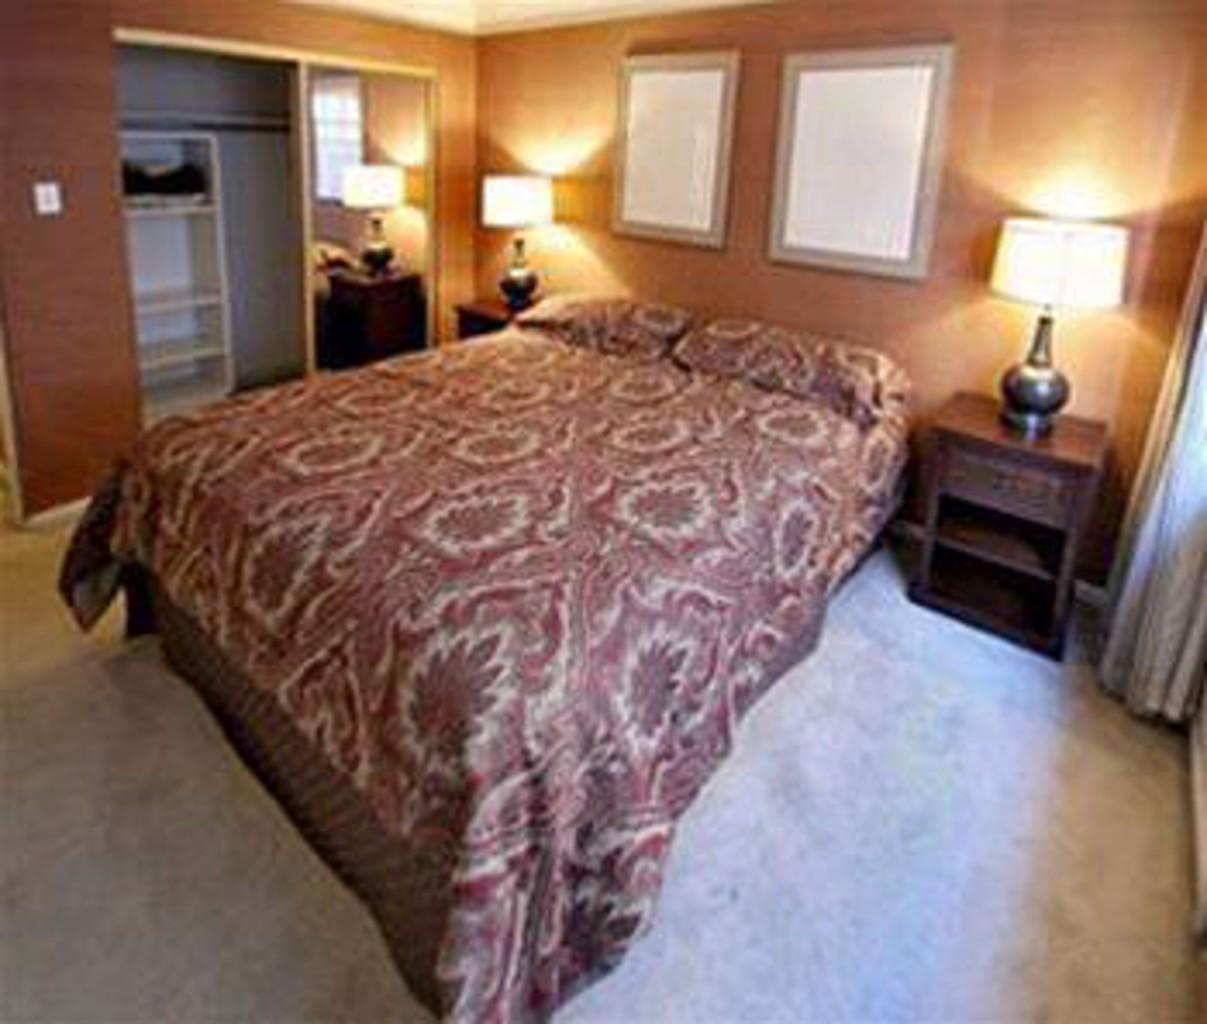 The Cambridge Condo Suites